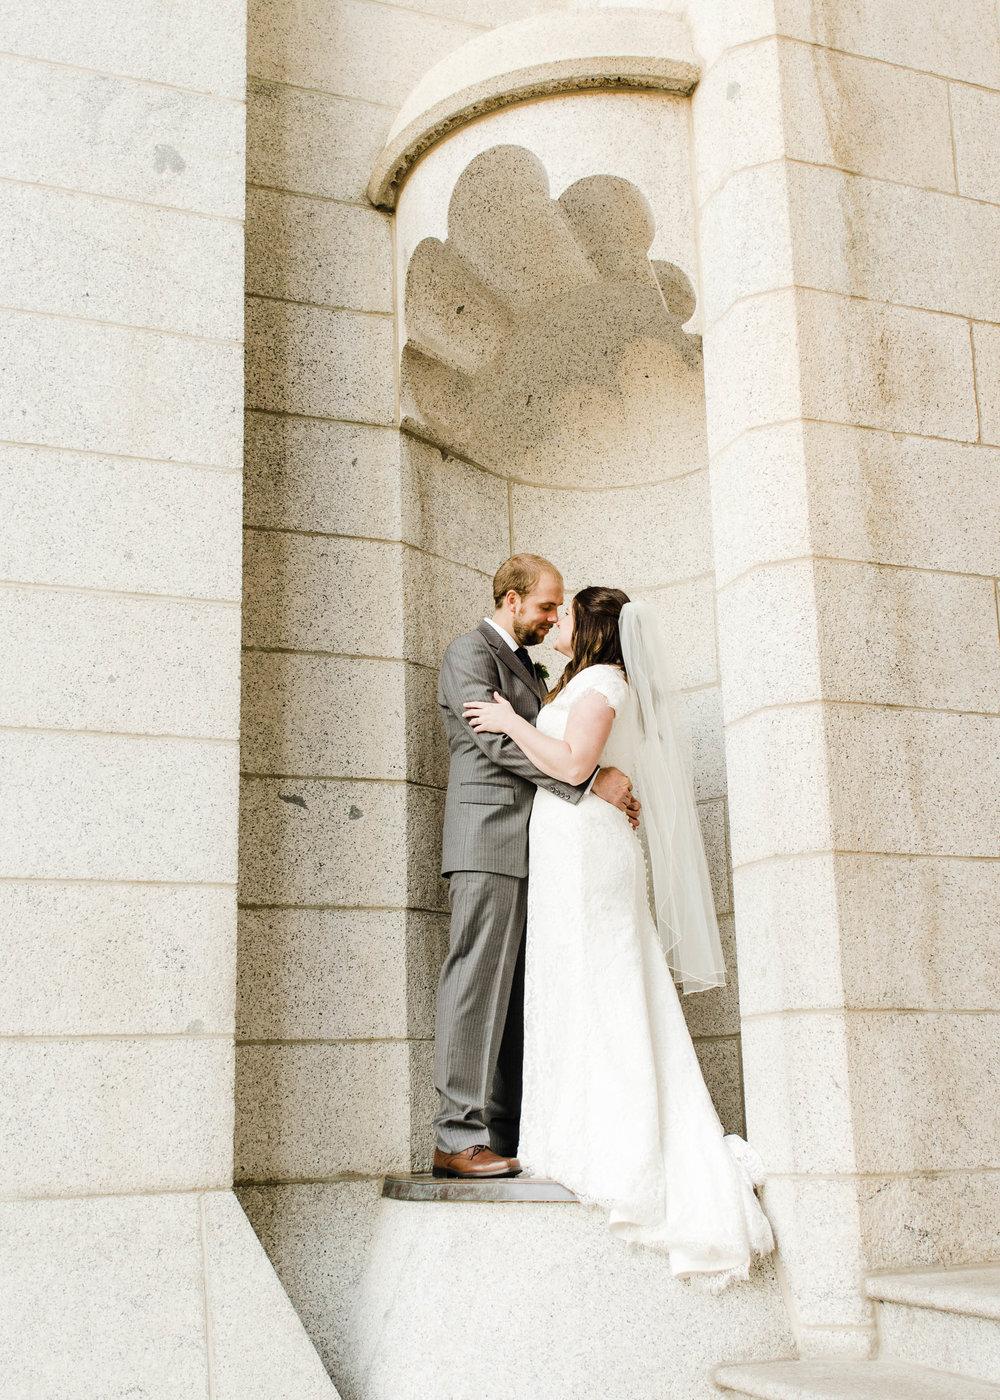 LINDSAY+BRAD-BRIDALS-Sadie_Banks_Photography-120.jpg